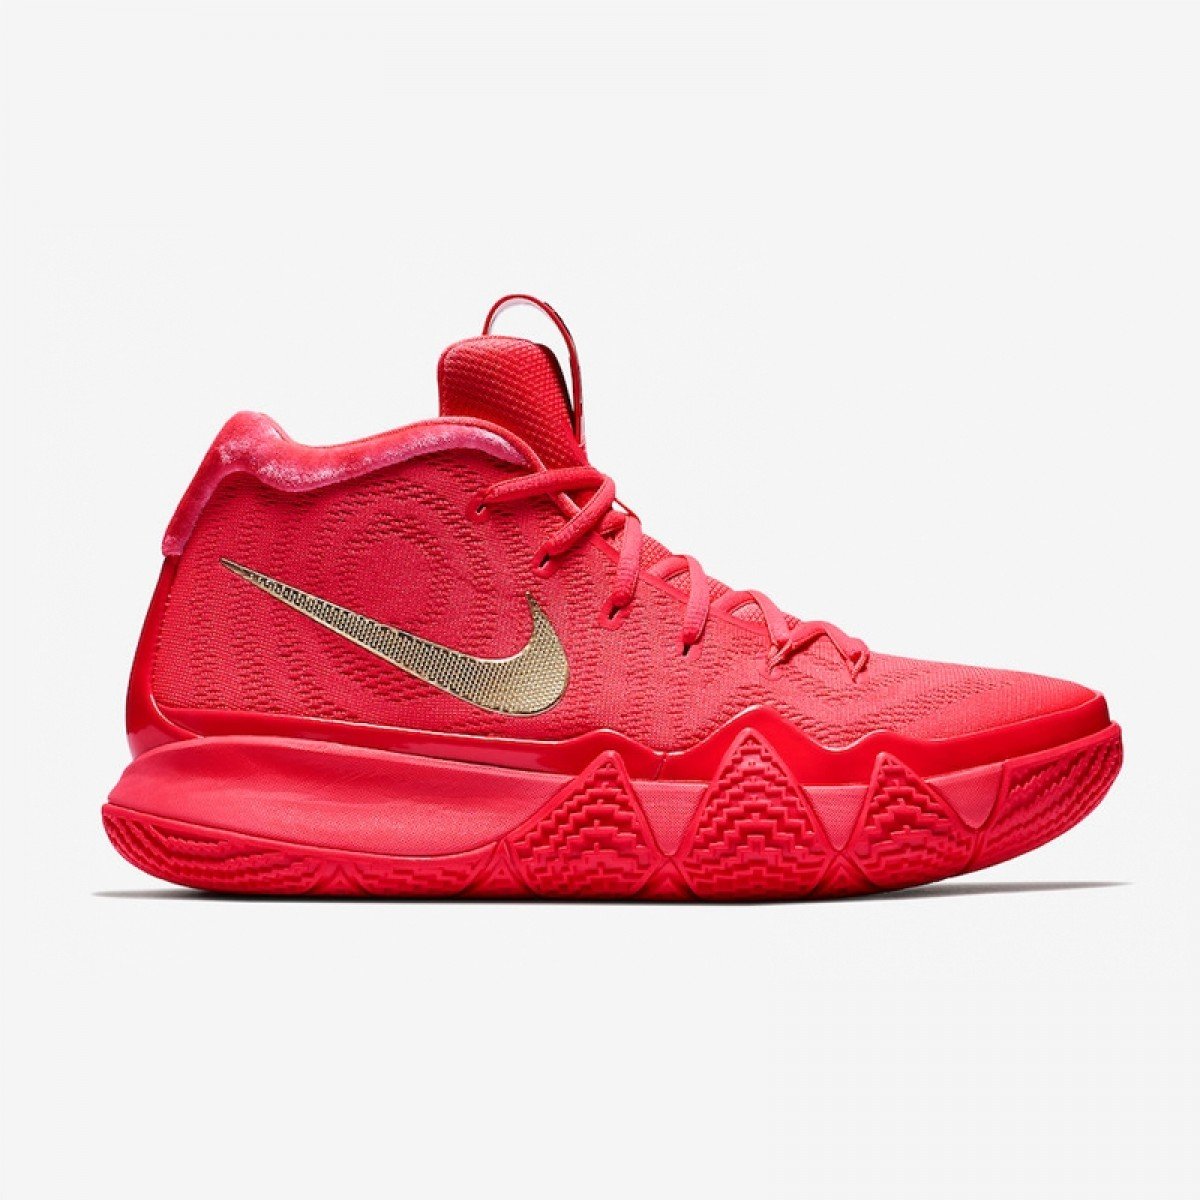 Nike Kyrie 4 'Red Carpet'